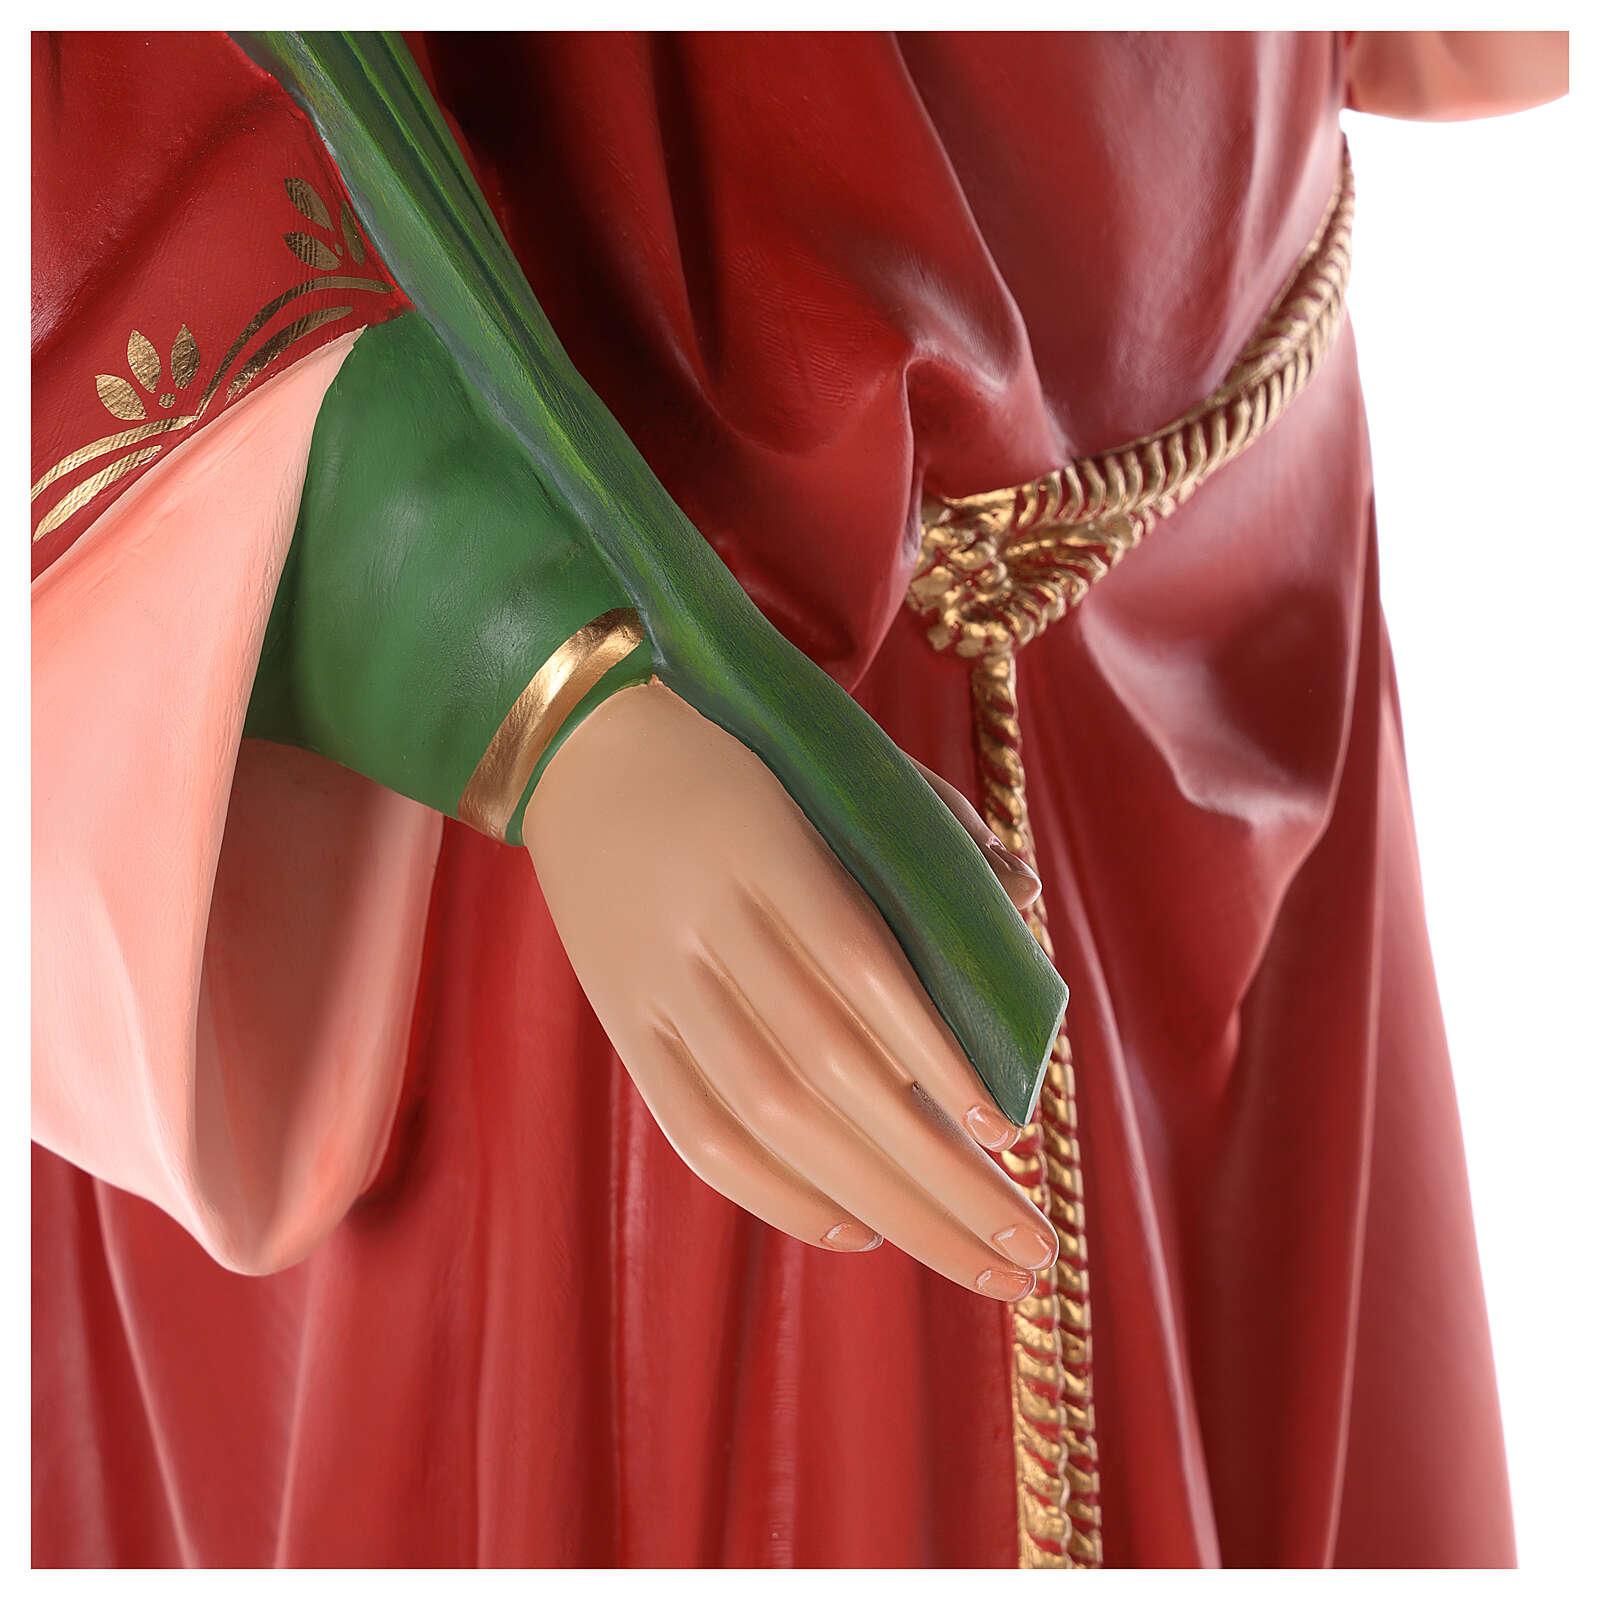 Santa Lucia statua vetroresina colorata 160 cm occhi vetro 4